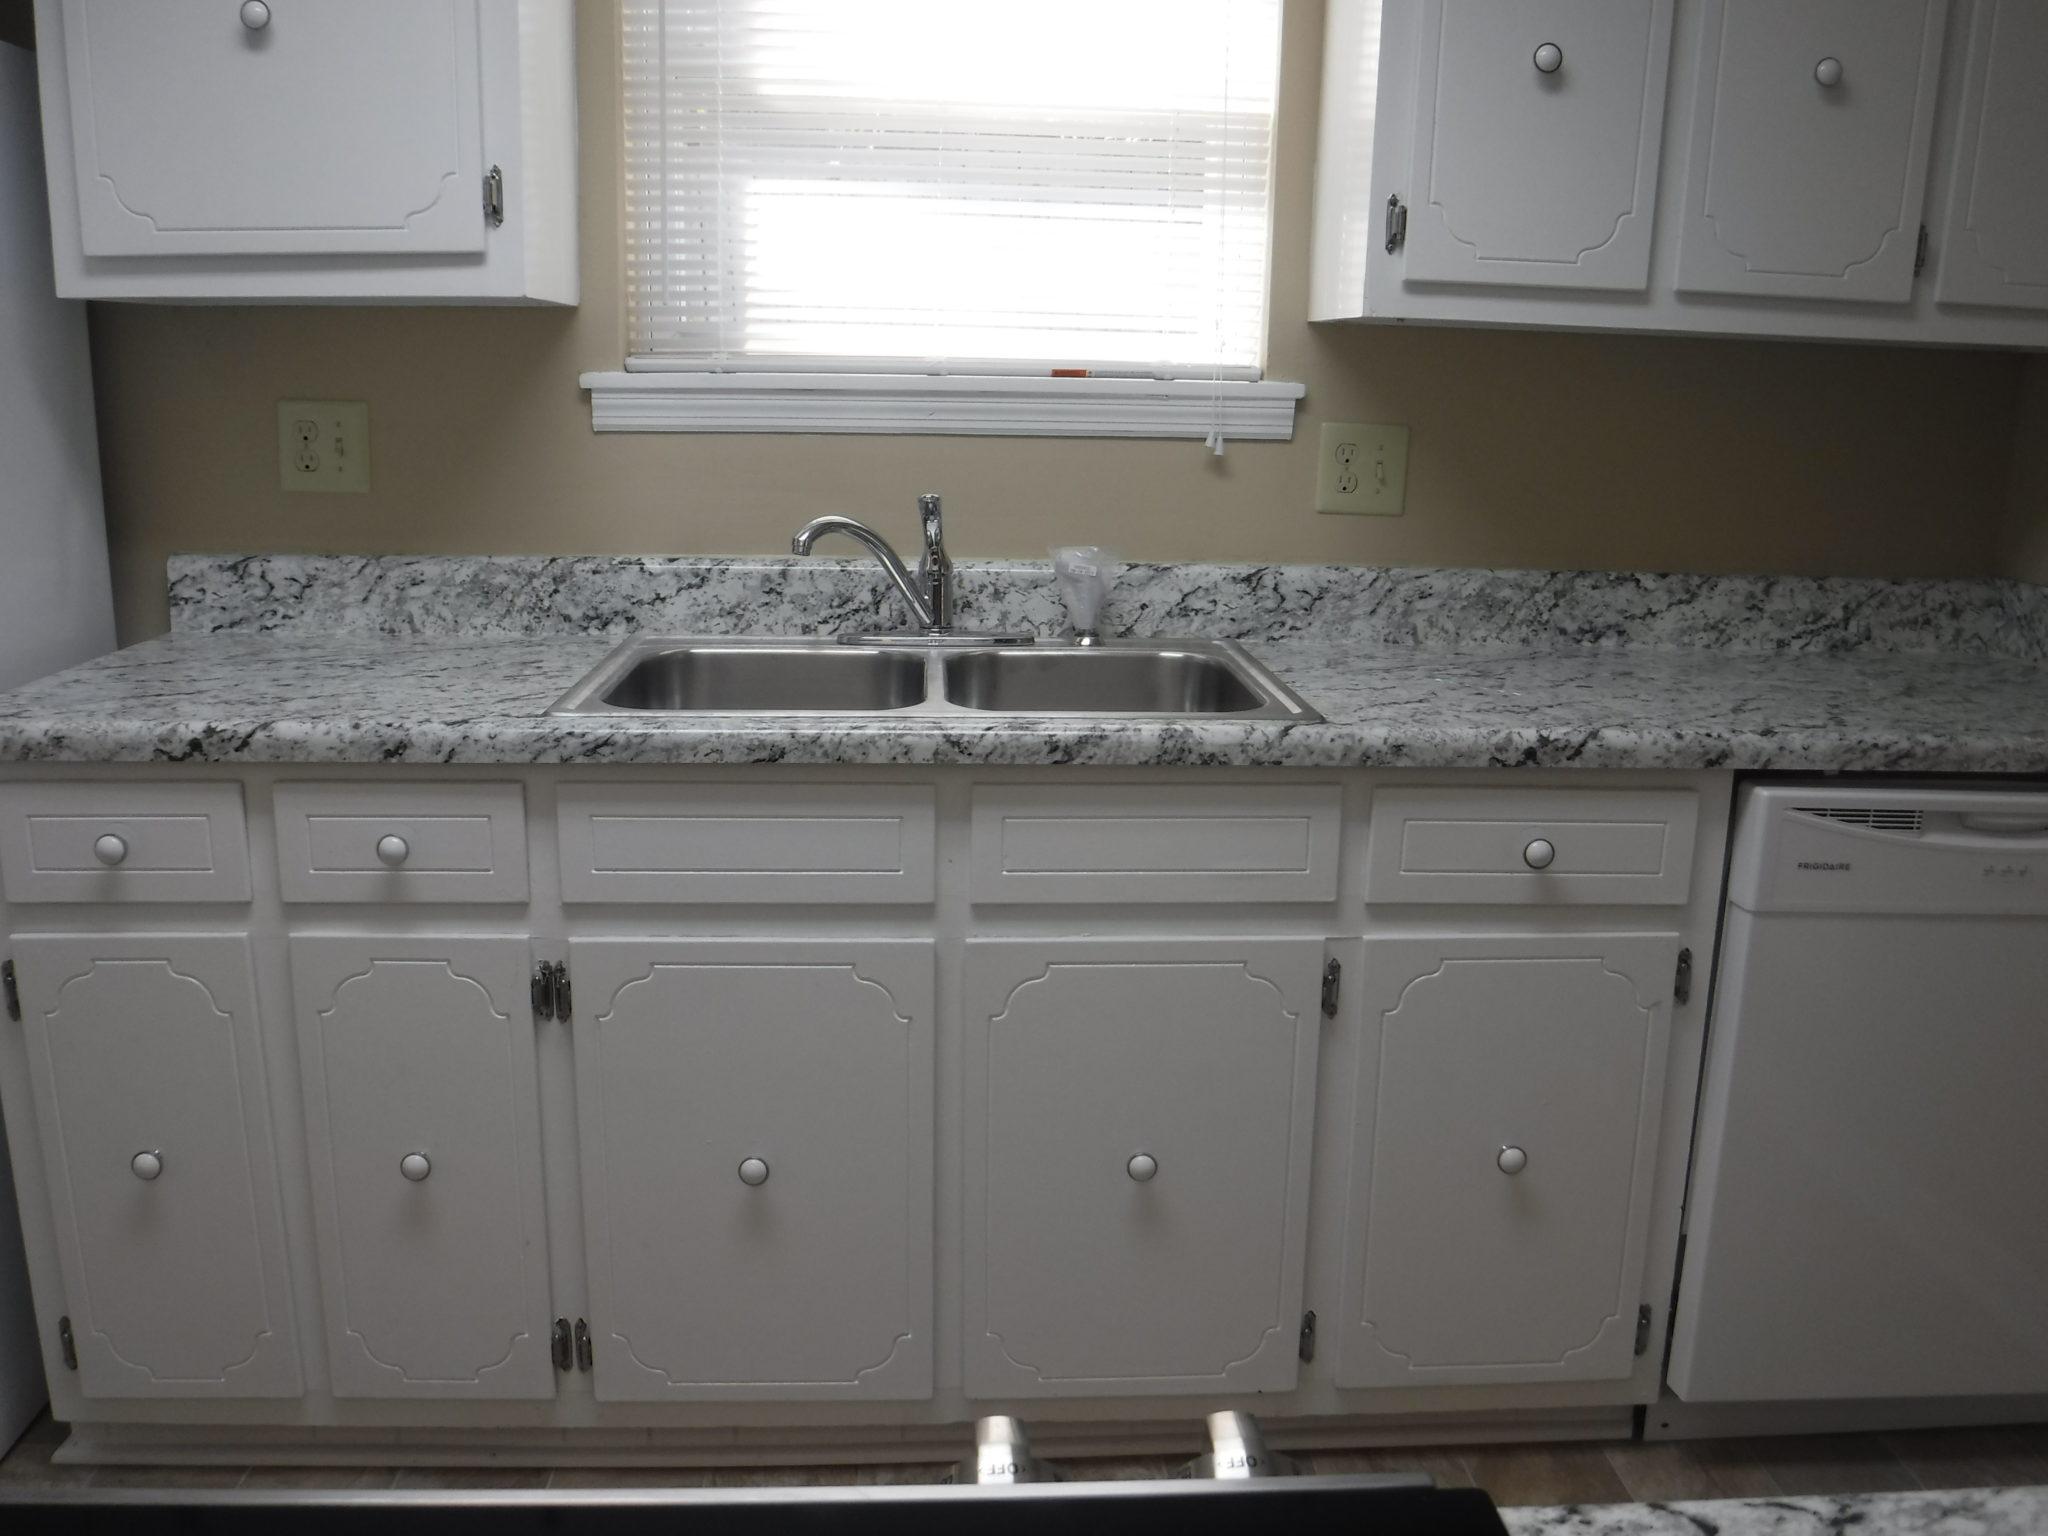 9 x 12 kitchen with new counter tops and all new appliances rh veteransrealtyaugusta com 9x12 kitchen 9x12 kitchen backsplash